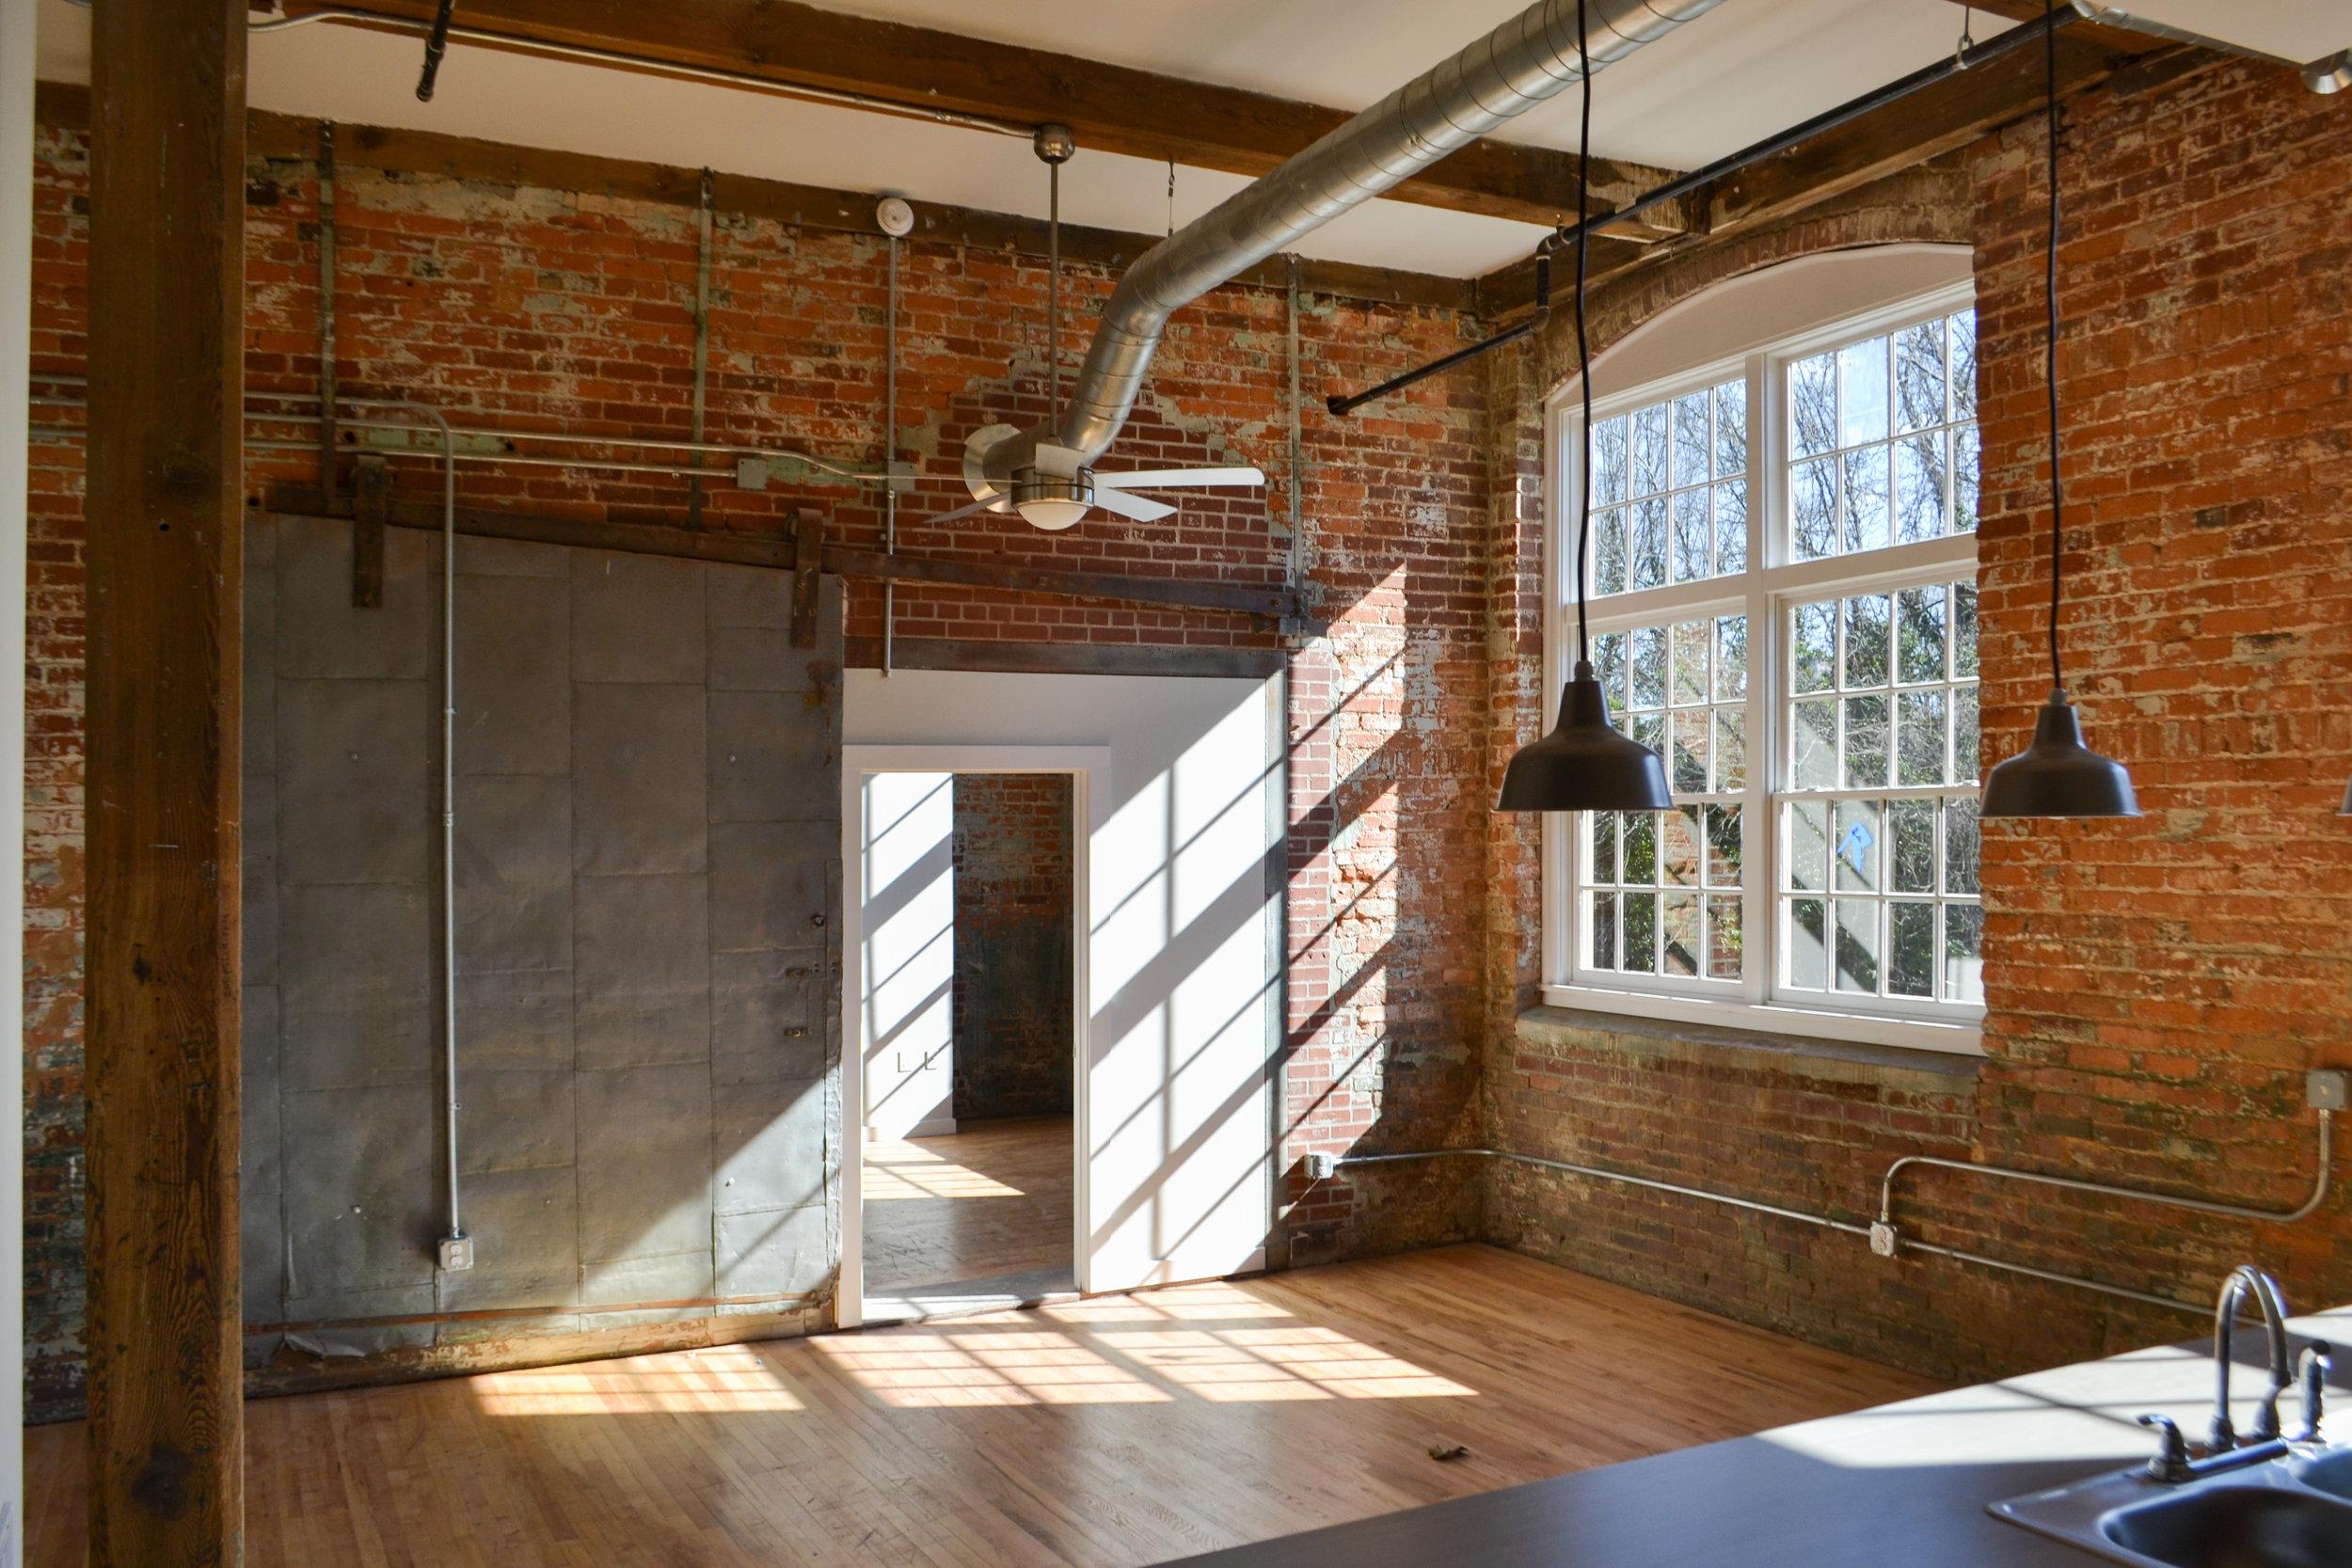 Mill 800 - Winston-Salem, NCResidentialClient: Chatham Mill Ventures, LLCBuilt: 1907, 1951Project Costs: $35.6 millionHTC equity: Over $10 million